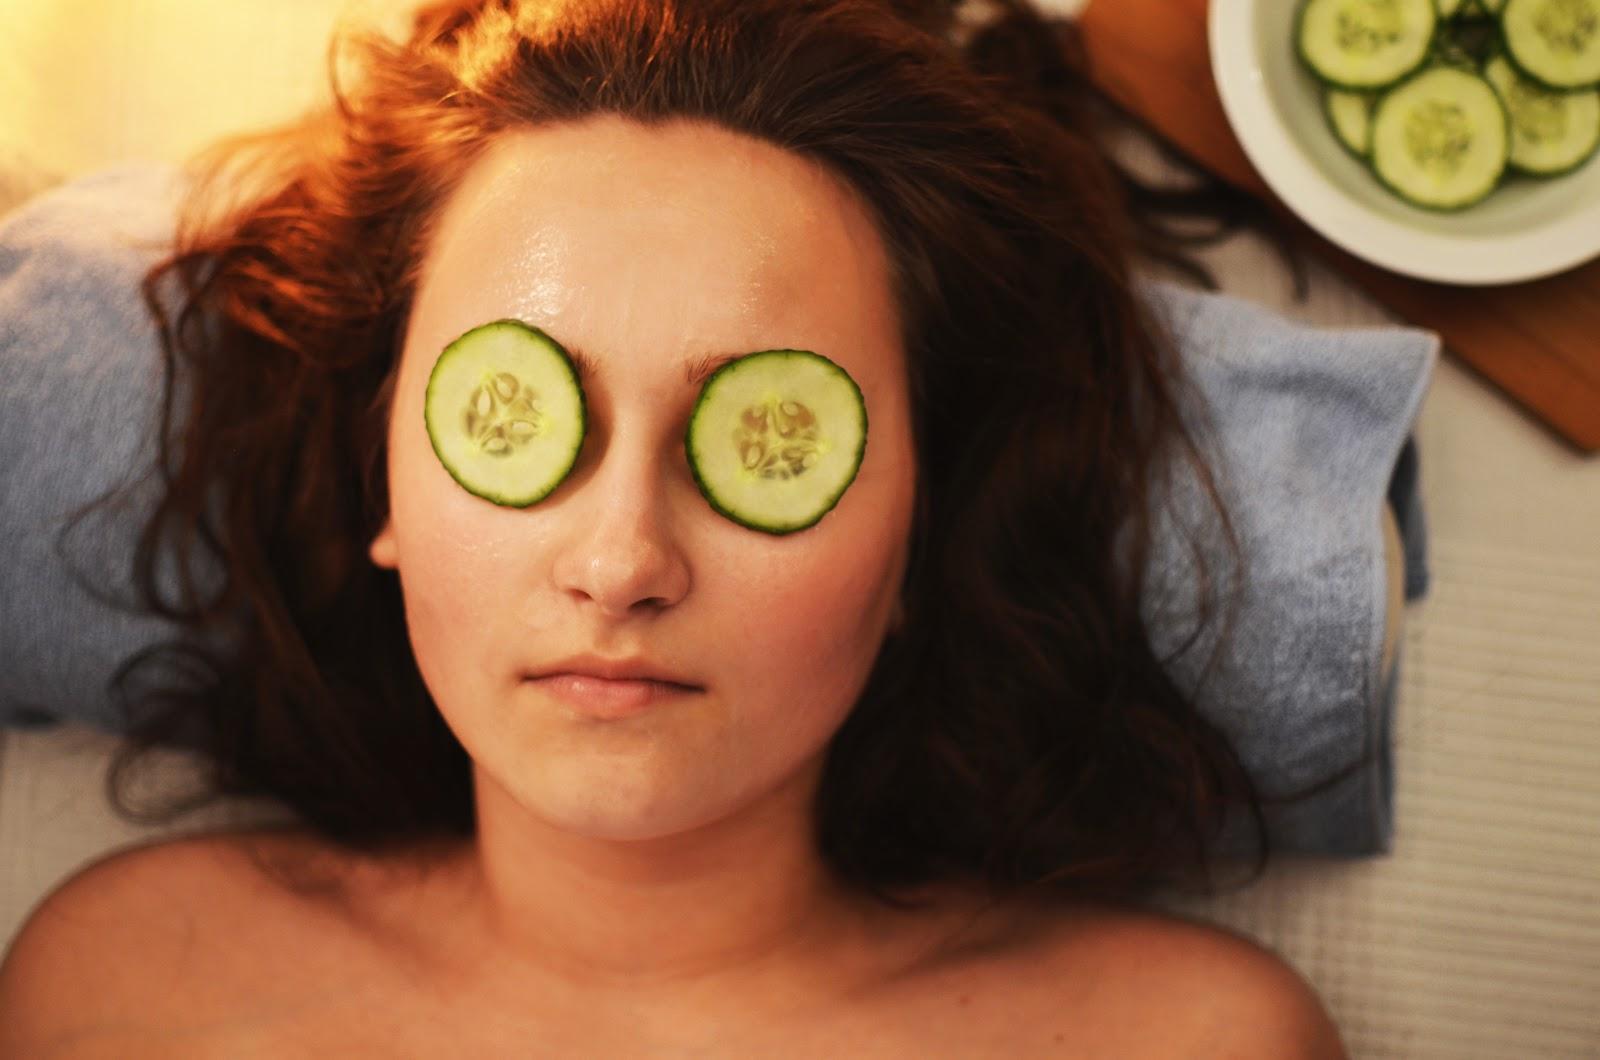 Relaxation tips for better sleep